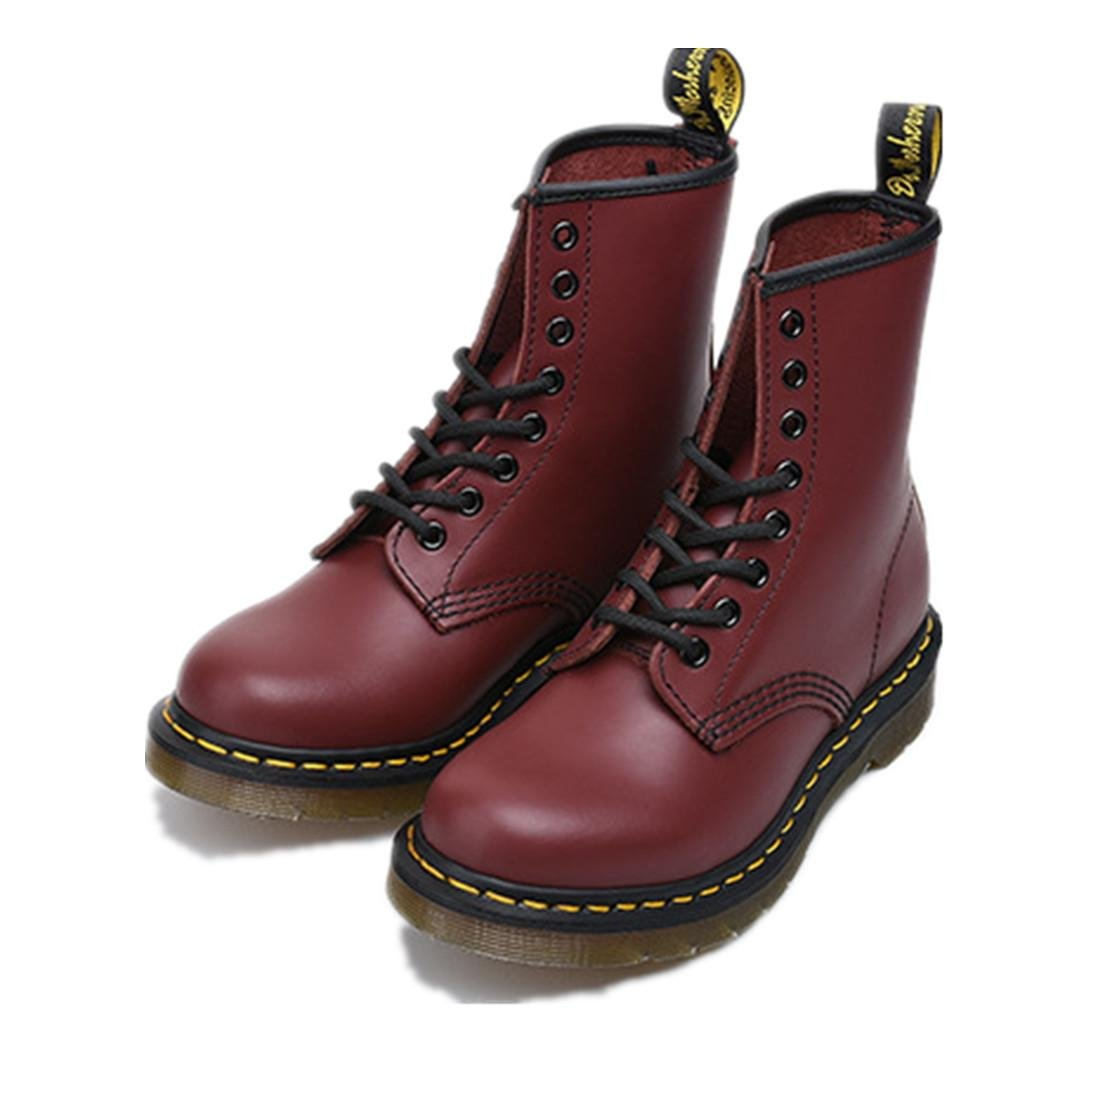 Damen Männer kurze Stiefel Dicke untere Paar Paar Paar Einzel Schuhe Flache neue Mode Martin Stiefel Schnüren sich oben Echtes Leder Anti-Verschleiß Anti-Rutsch Wein Rot Frühling Herbst Winter d92ee2